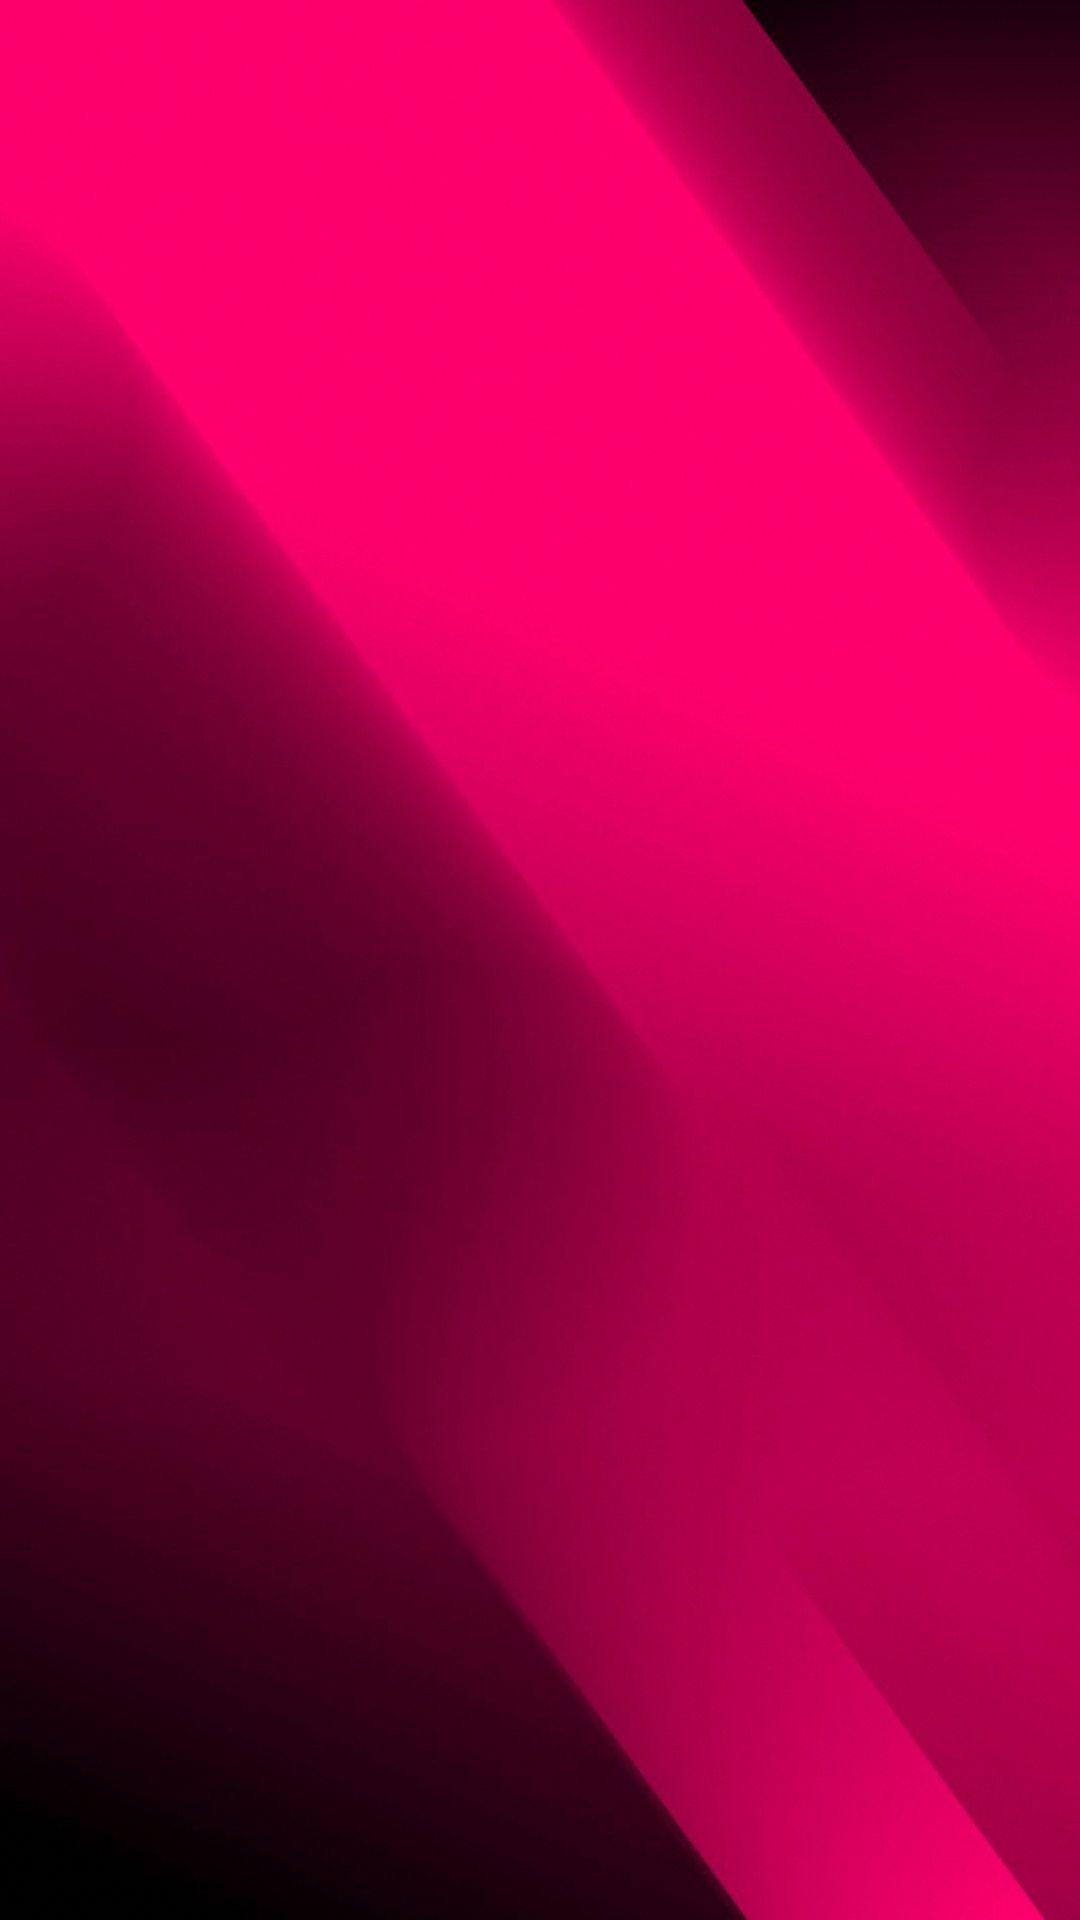 Unduh 71 Background Pink Abstrak Hd HD Terbaru